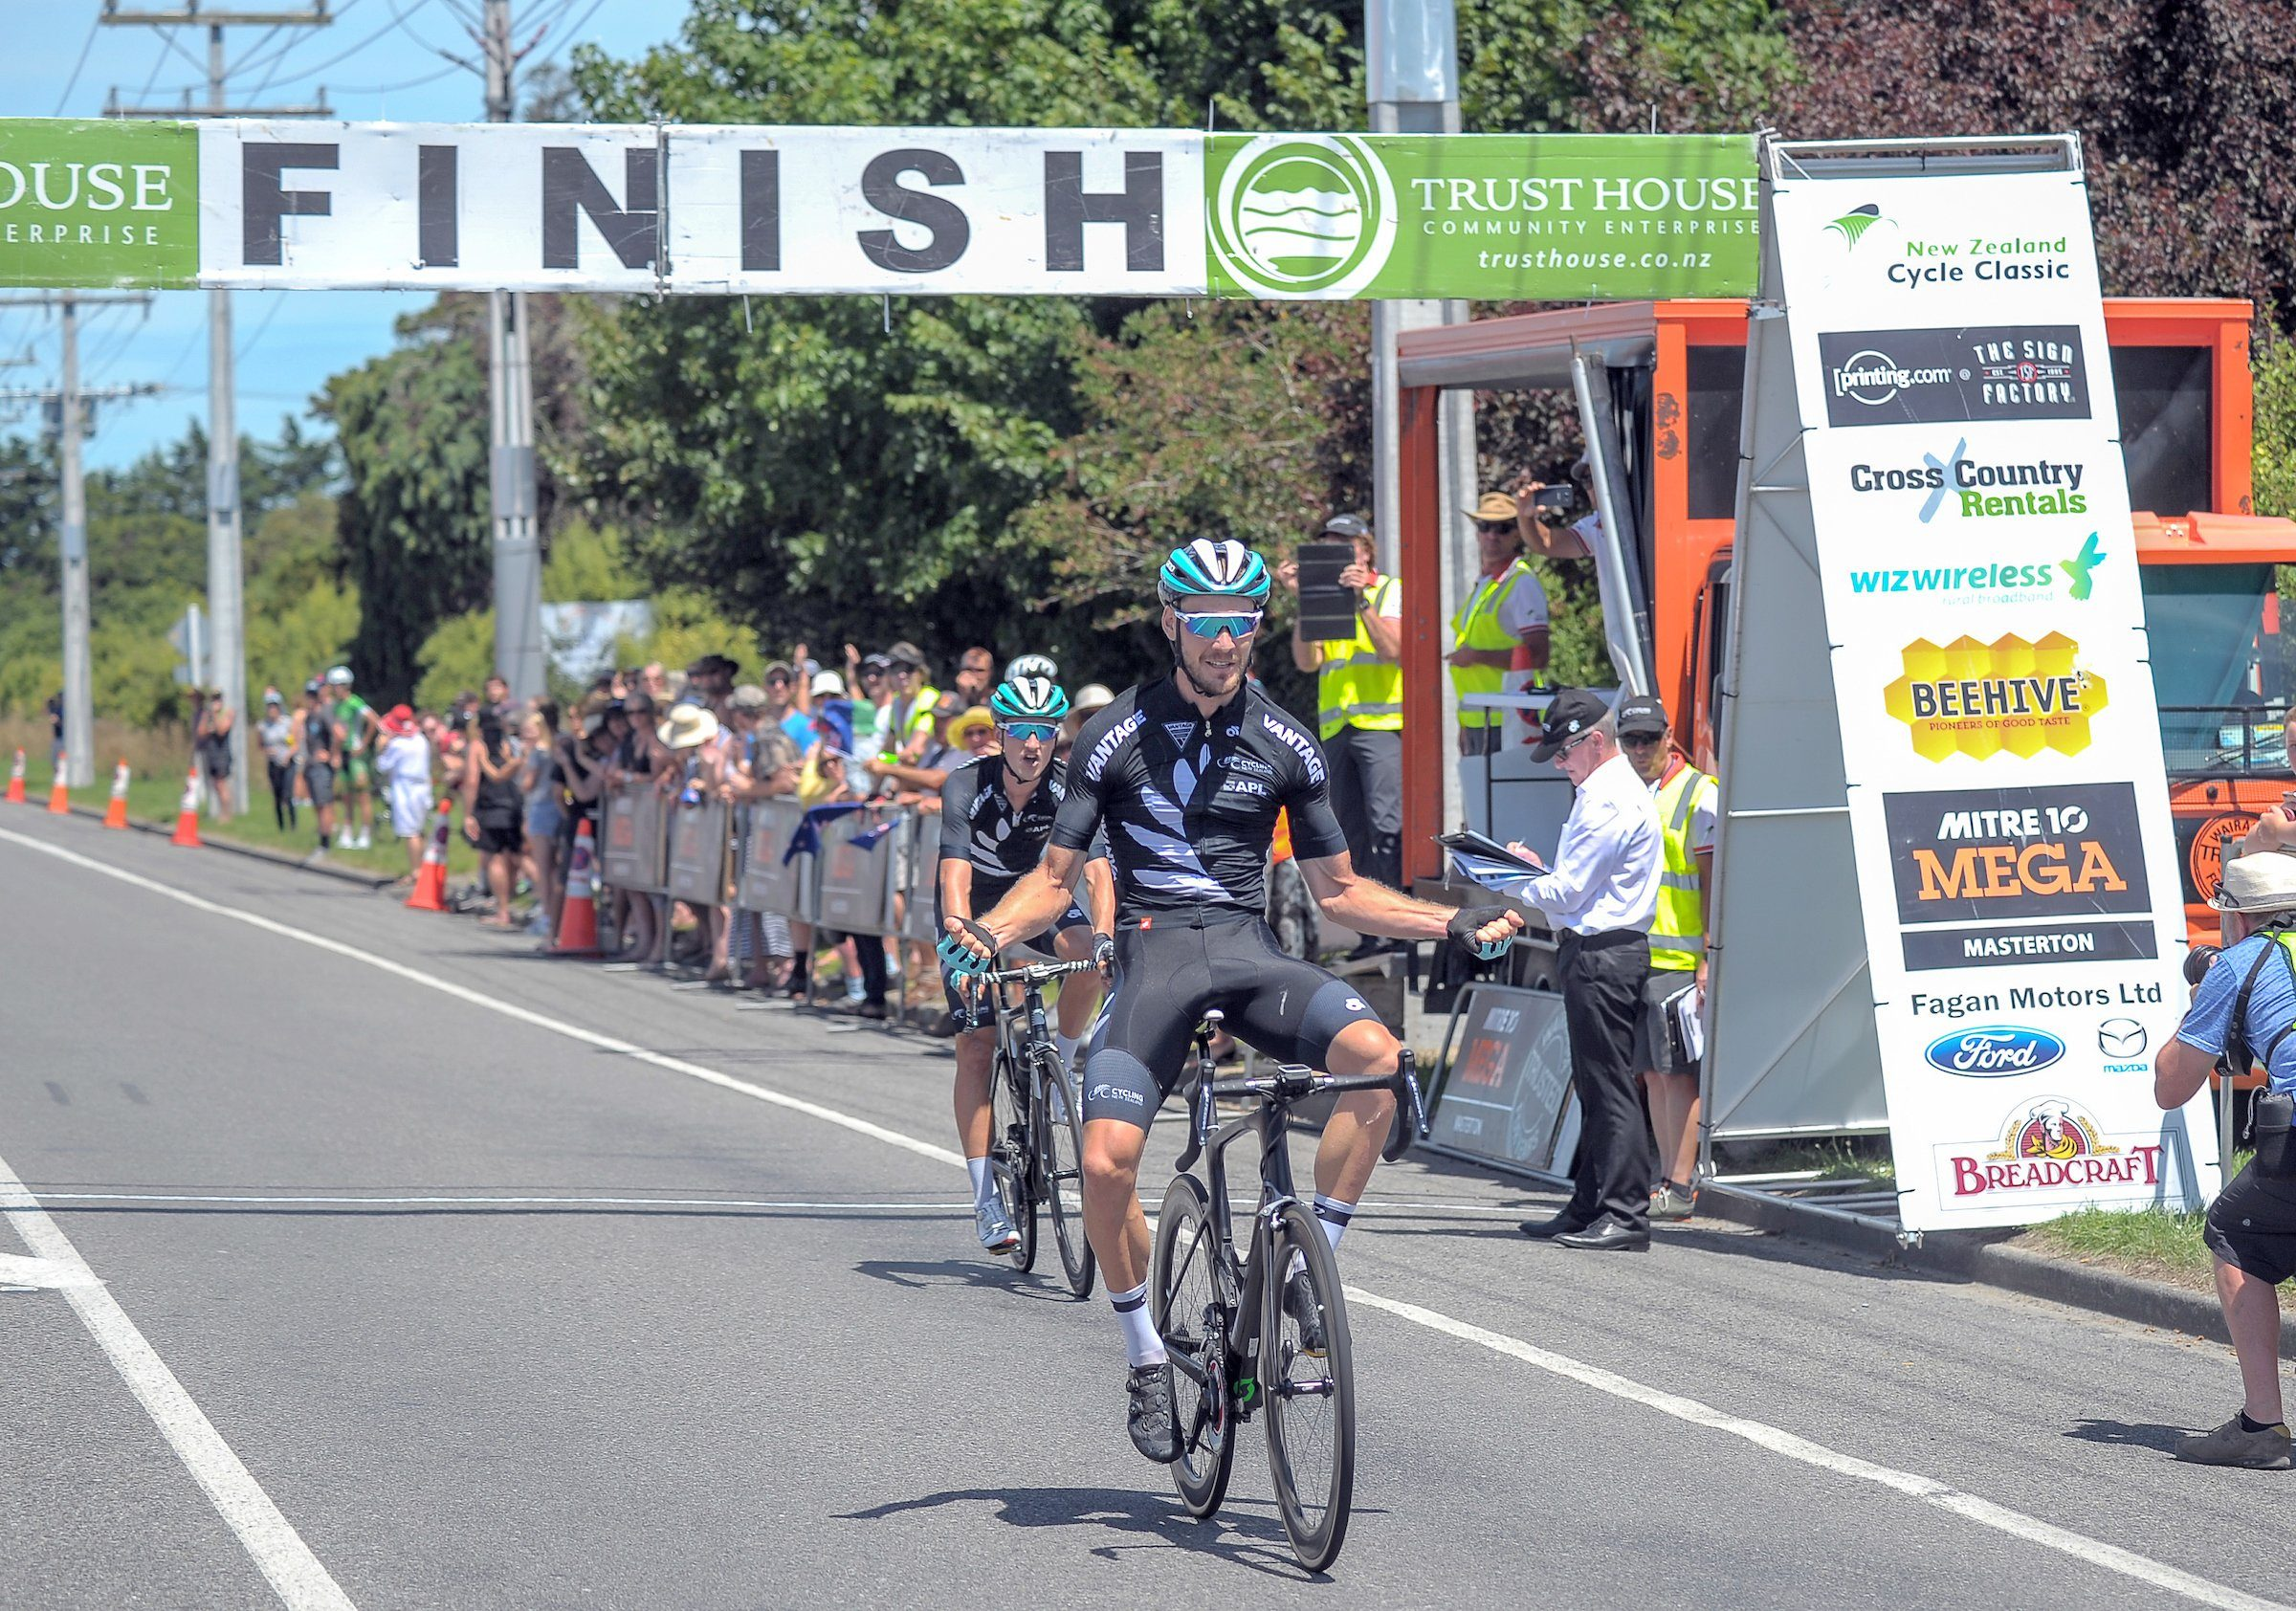 Хайден МакКормик выиграл велогонку New Zealand Cycle Classic